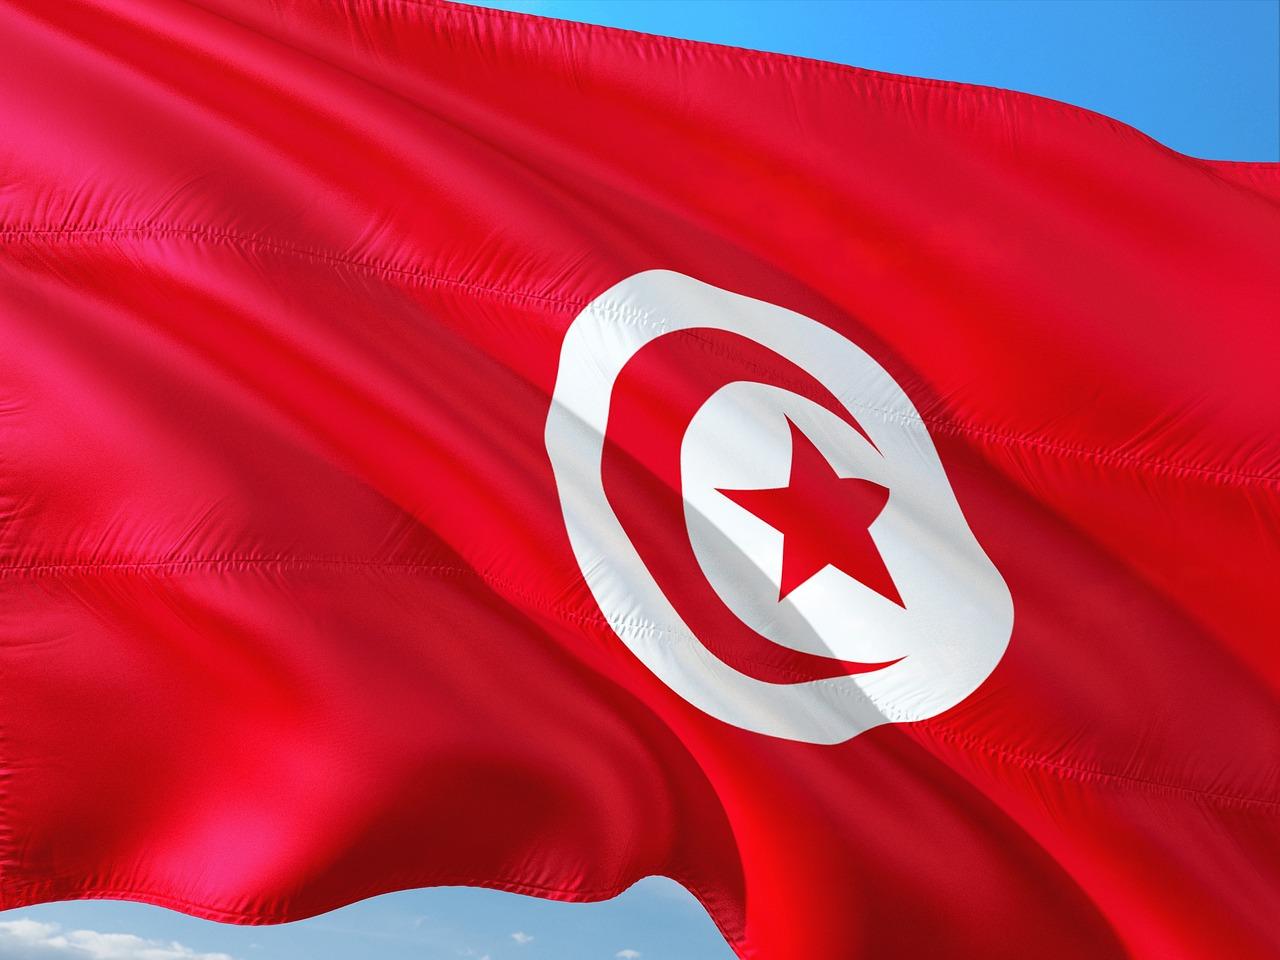 тунис флаг фото картинки является достаточно